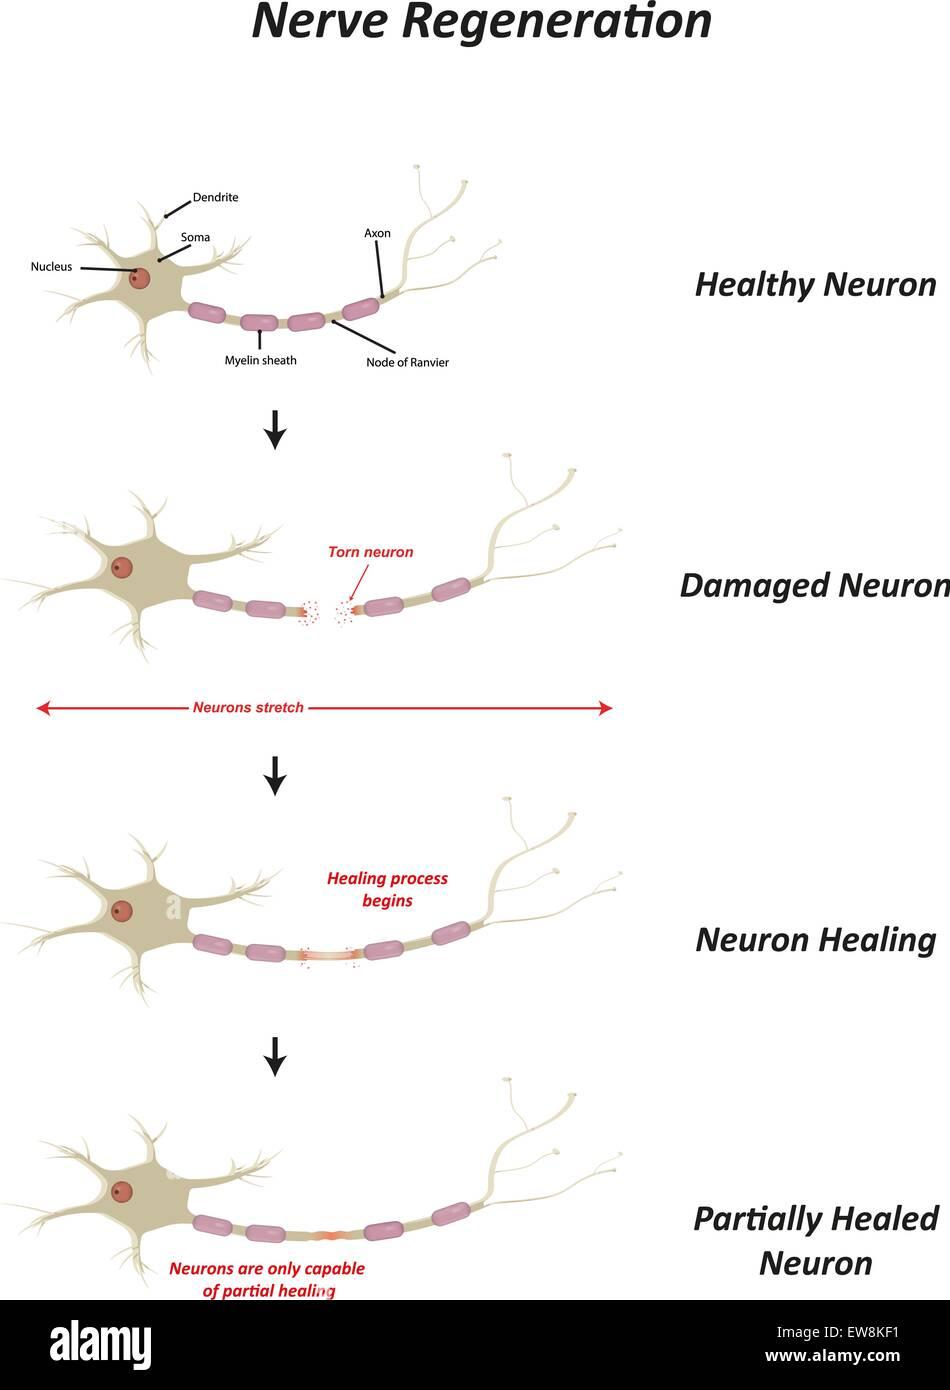 Nerve Regeneration - Stock Image